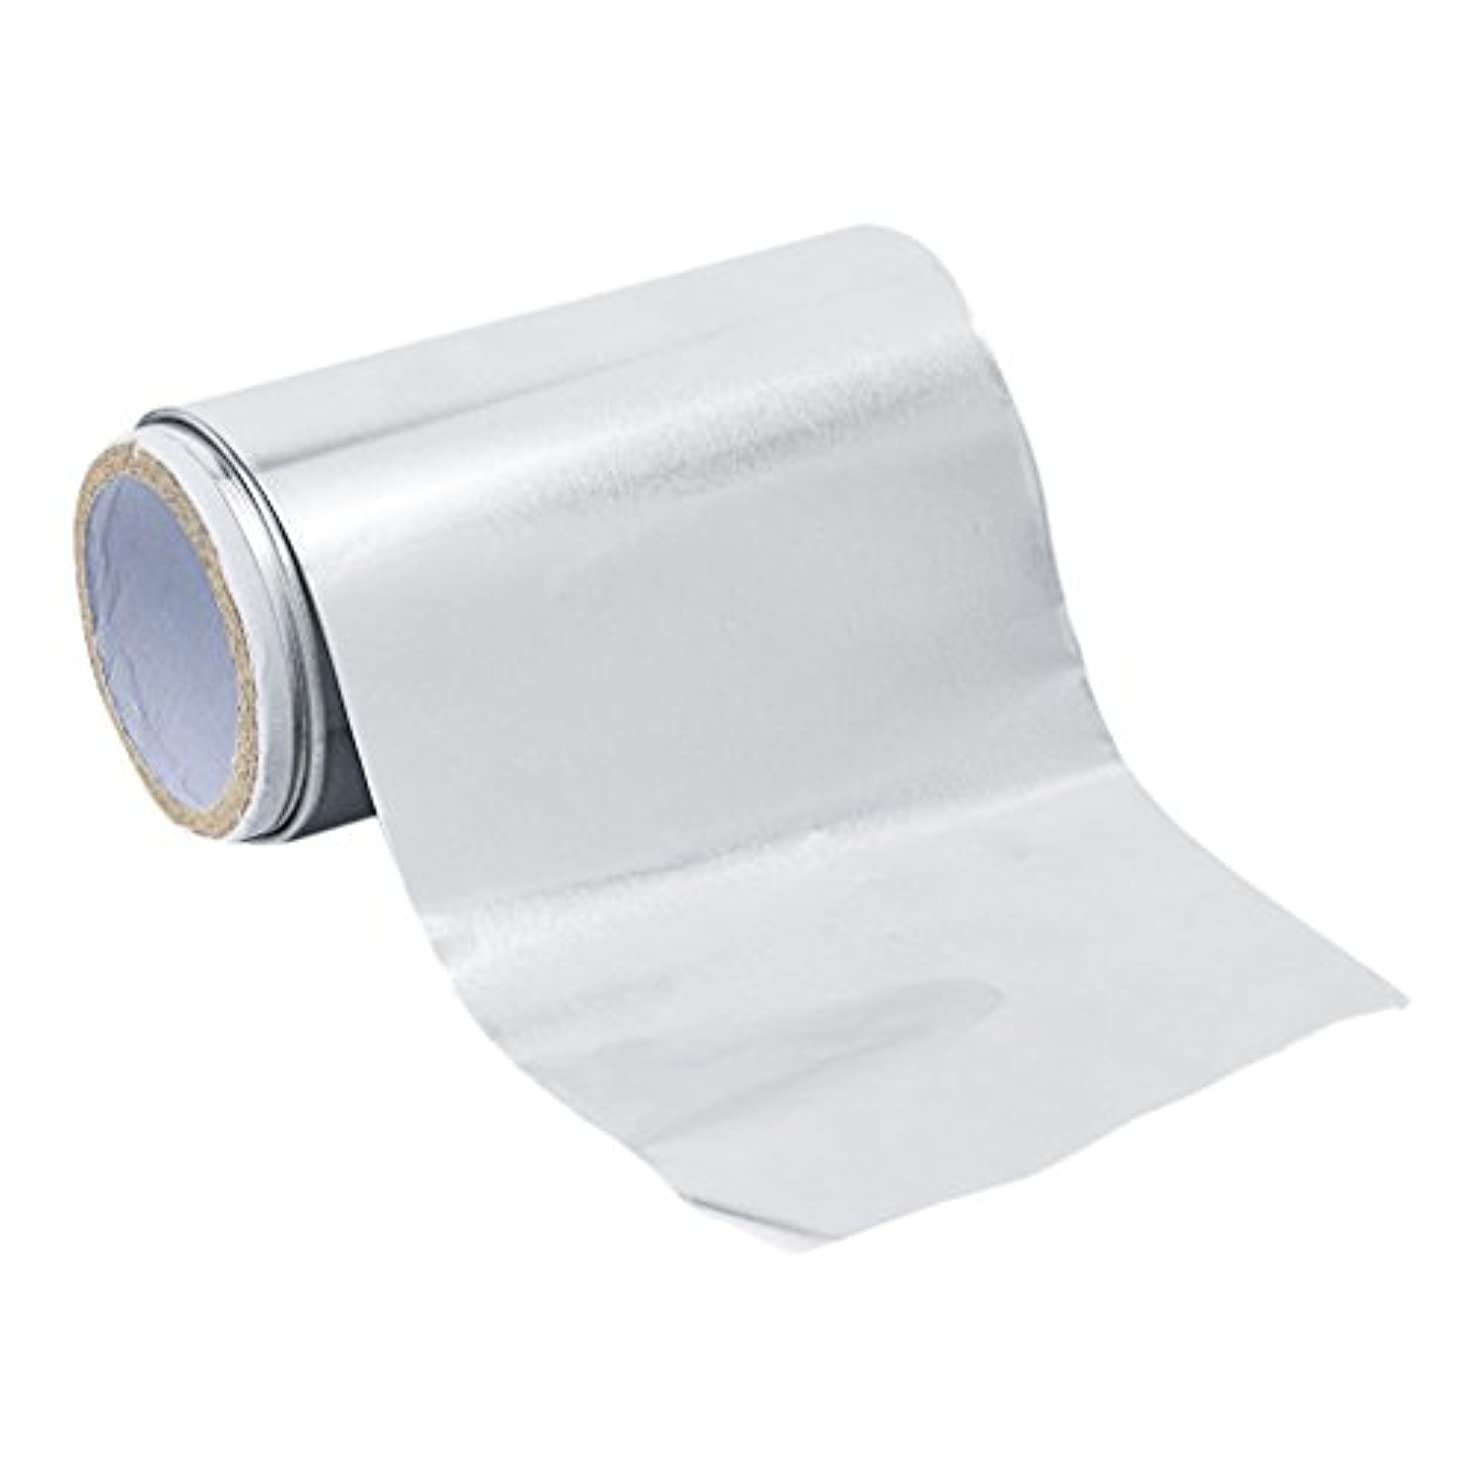 Fenteer アルミニウム ヘア/ネイル用 錫箔紙 ネイルアート 爪化粧用具  クリーナーツール ジェル除却 5m